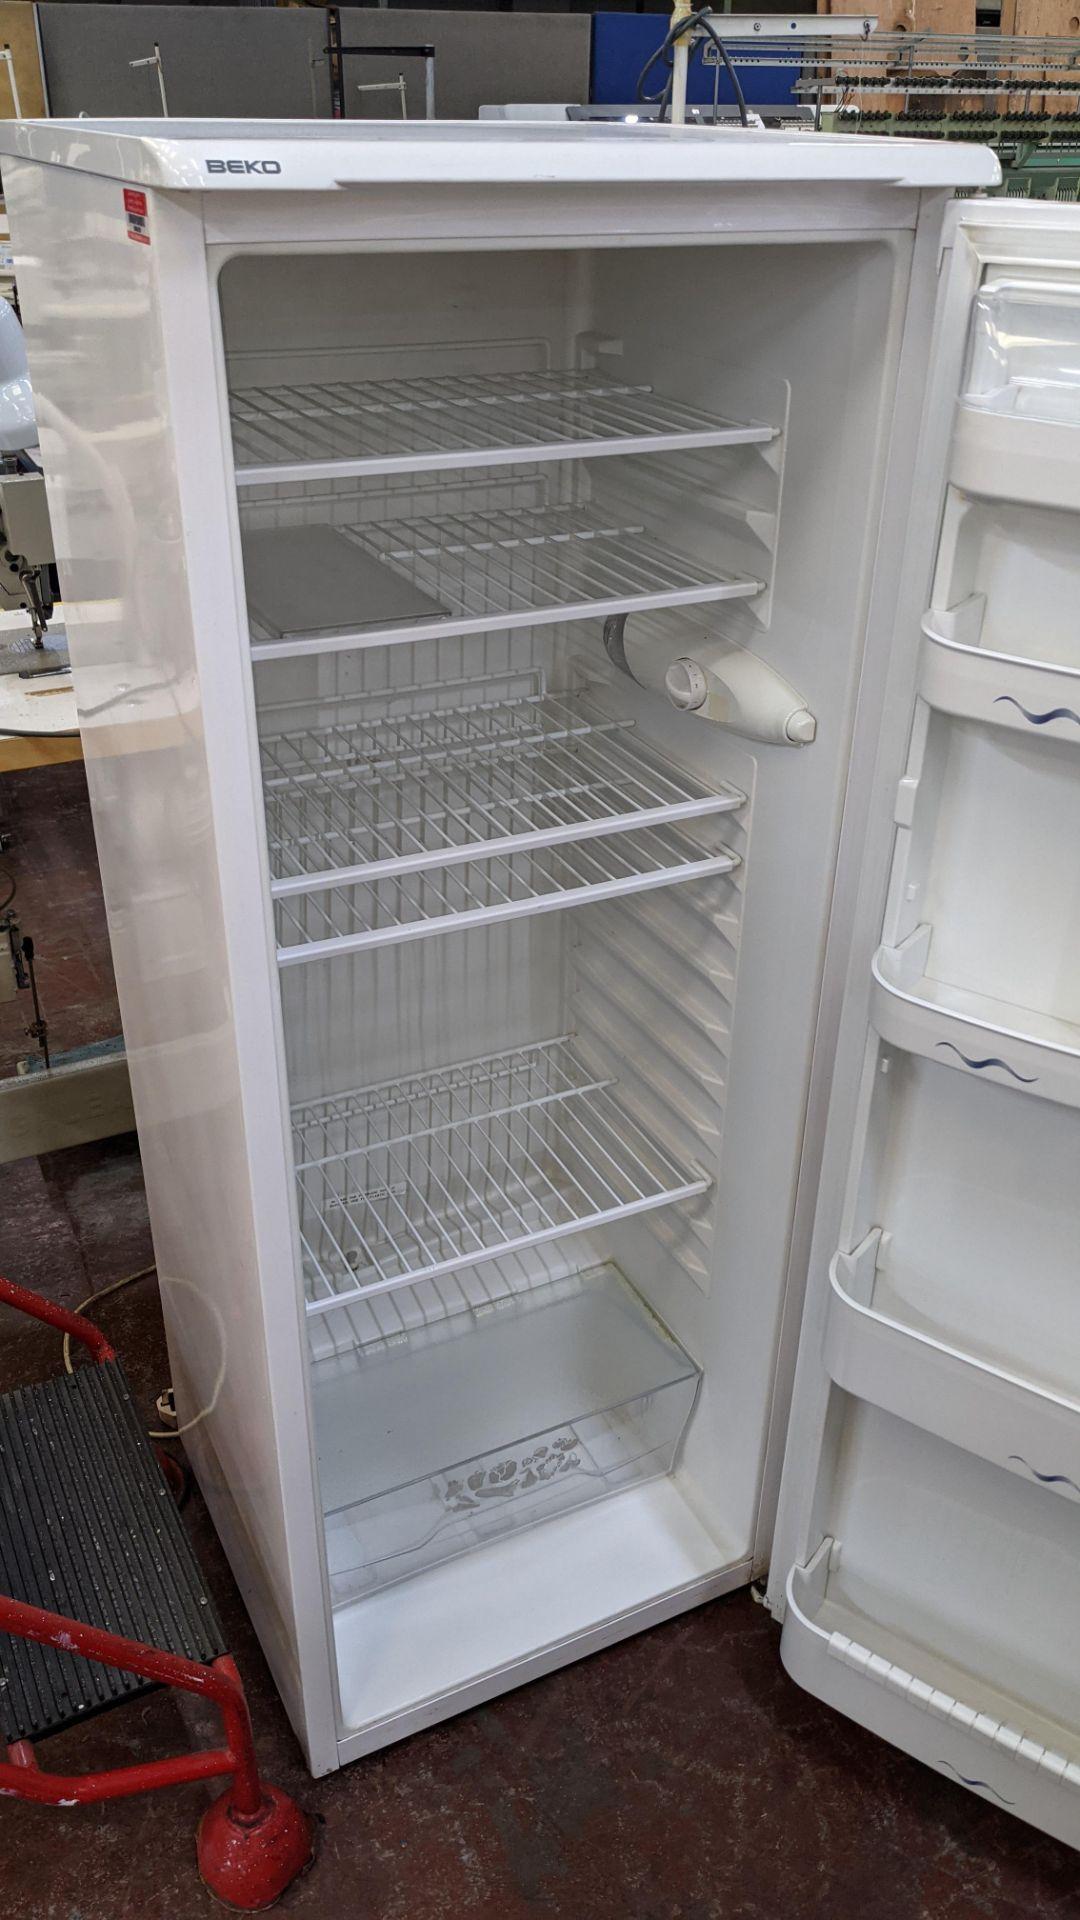 Beko tall fridge - Image 4 of 5